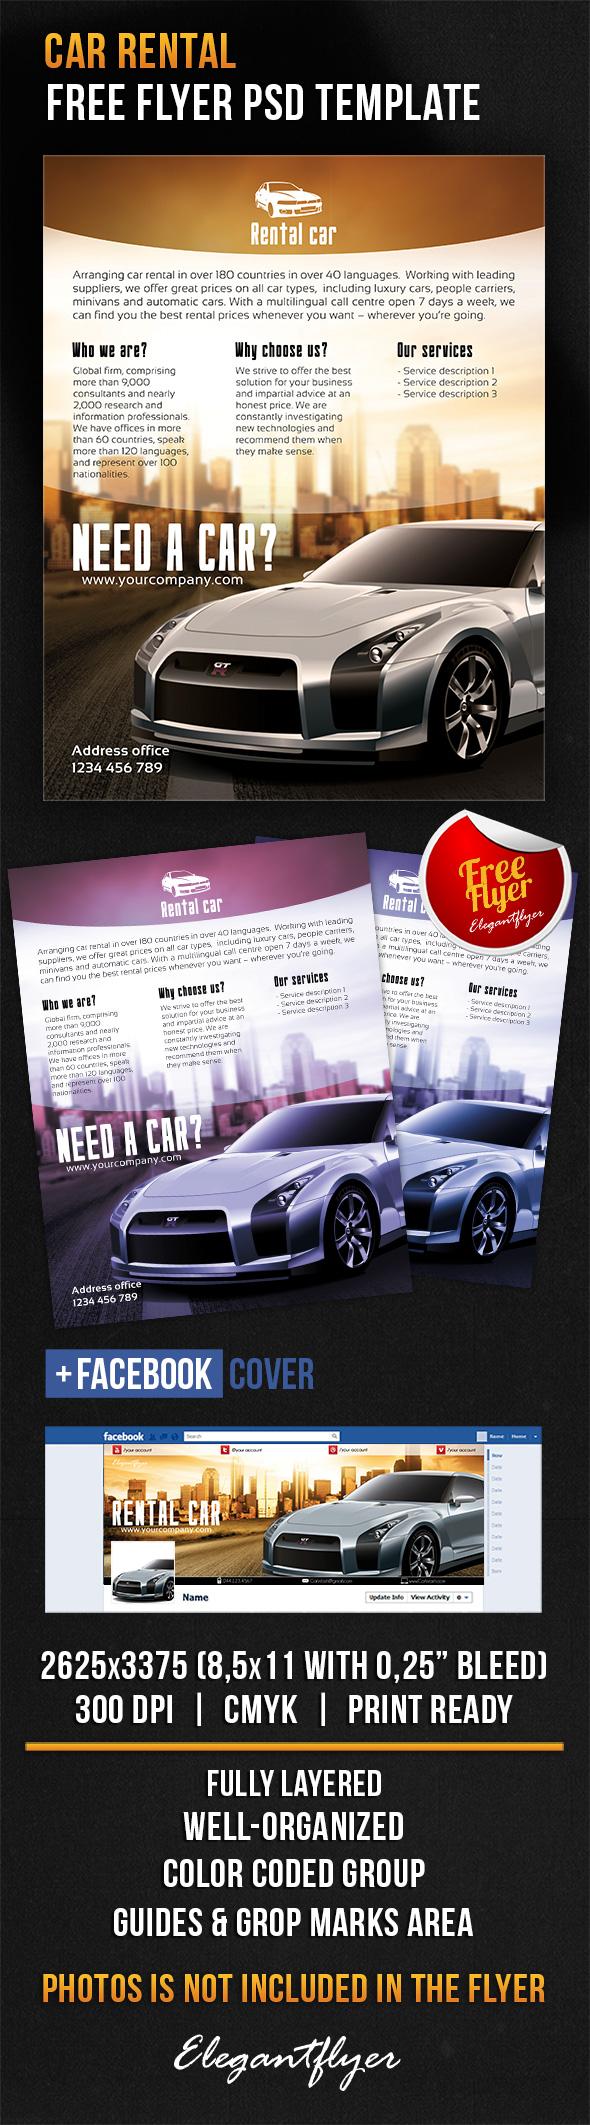 Car Rental Free Flyer Psd Template Facebook Cover Psd Templates Flyer Website Design